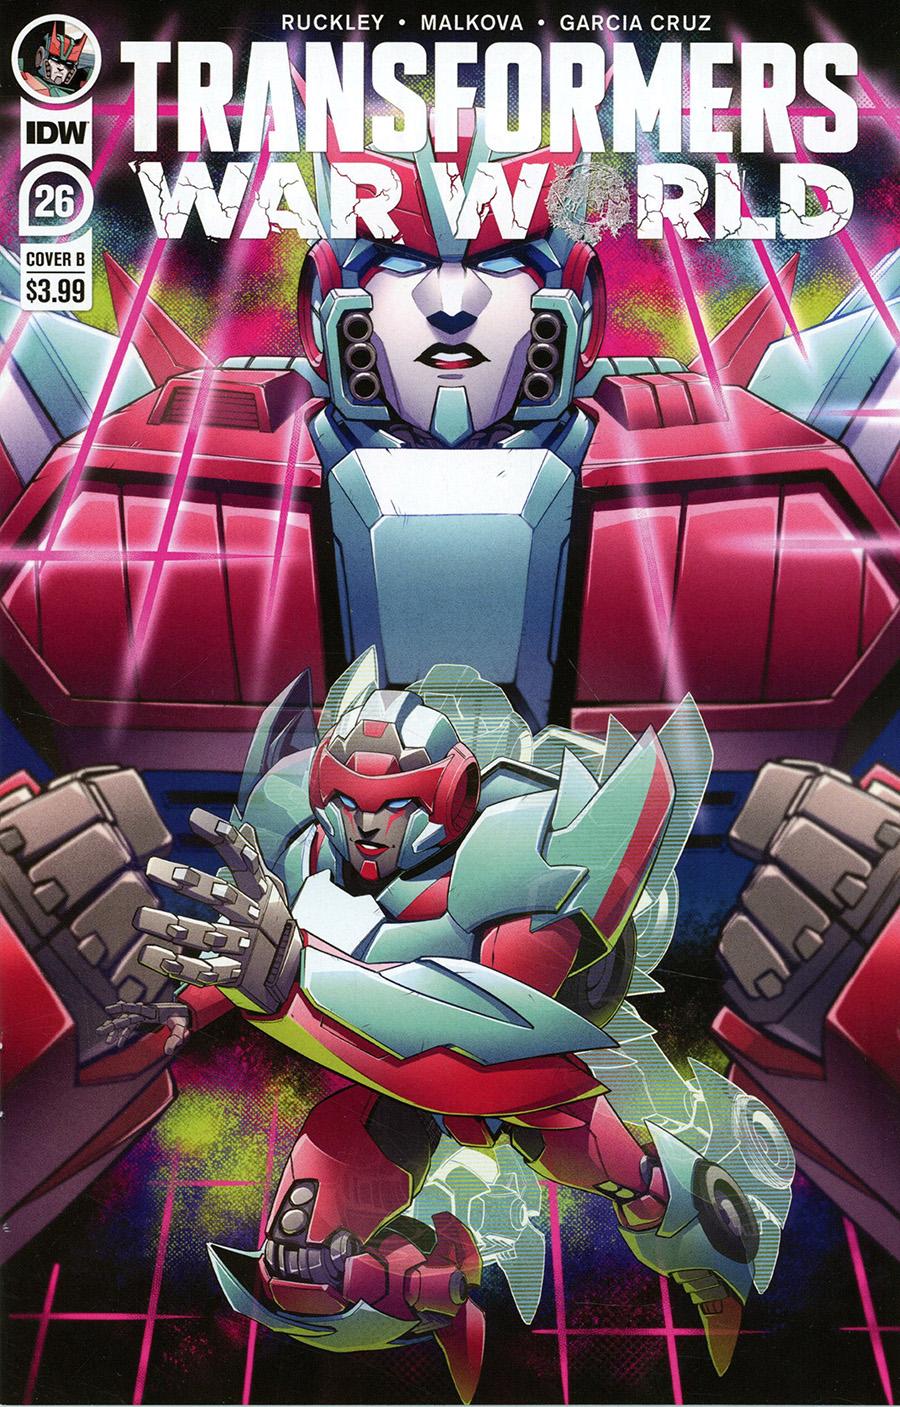 Transformers Vol 4 #26 Cover B Variant Billie Montfort Cover